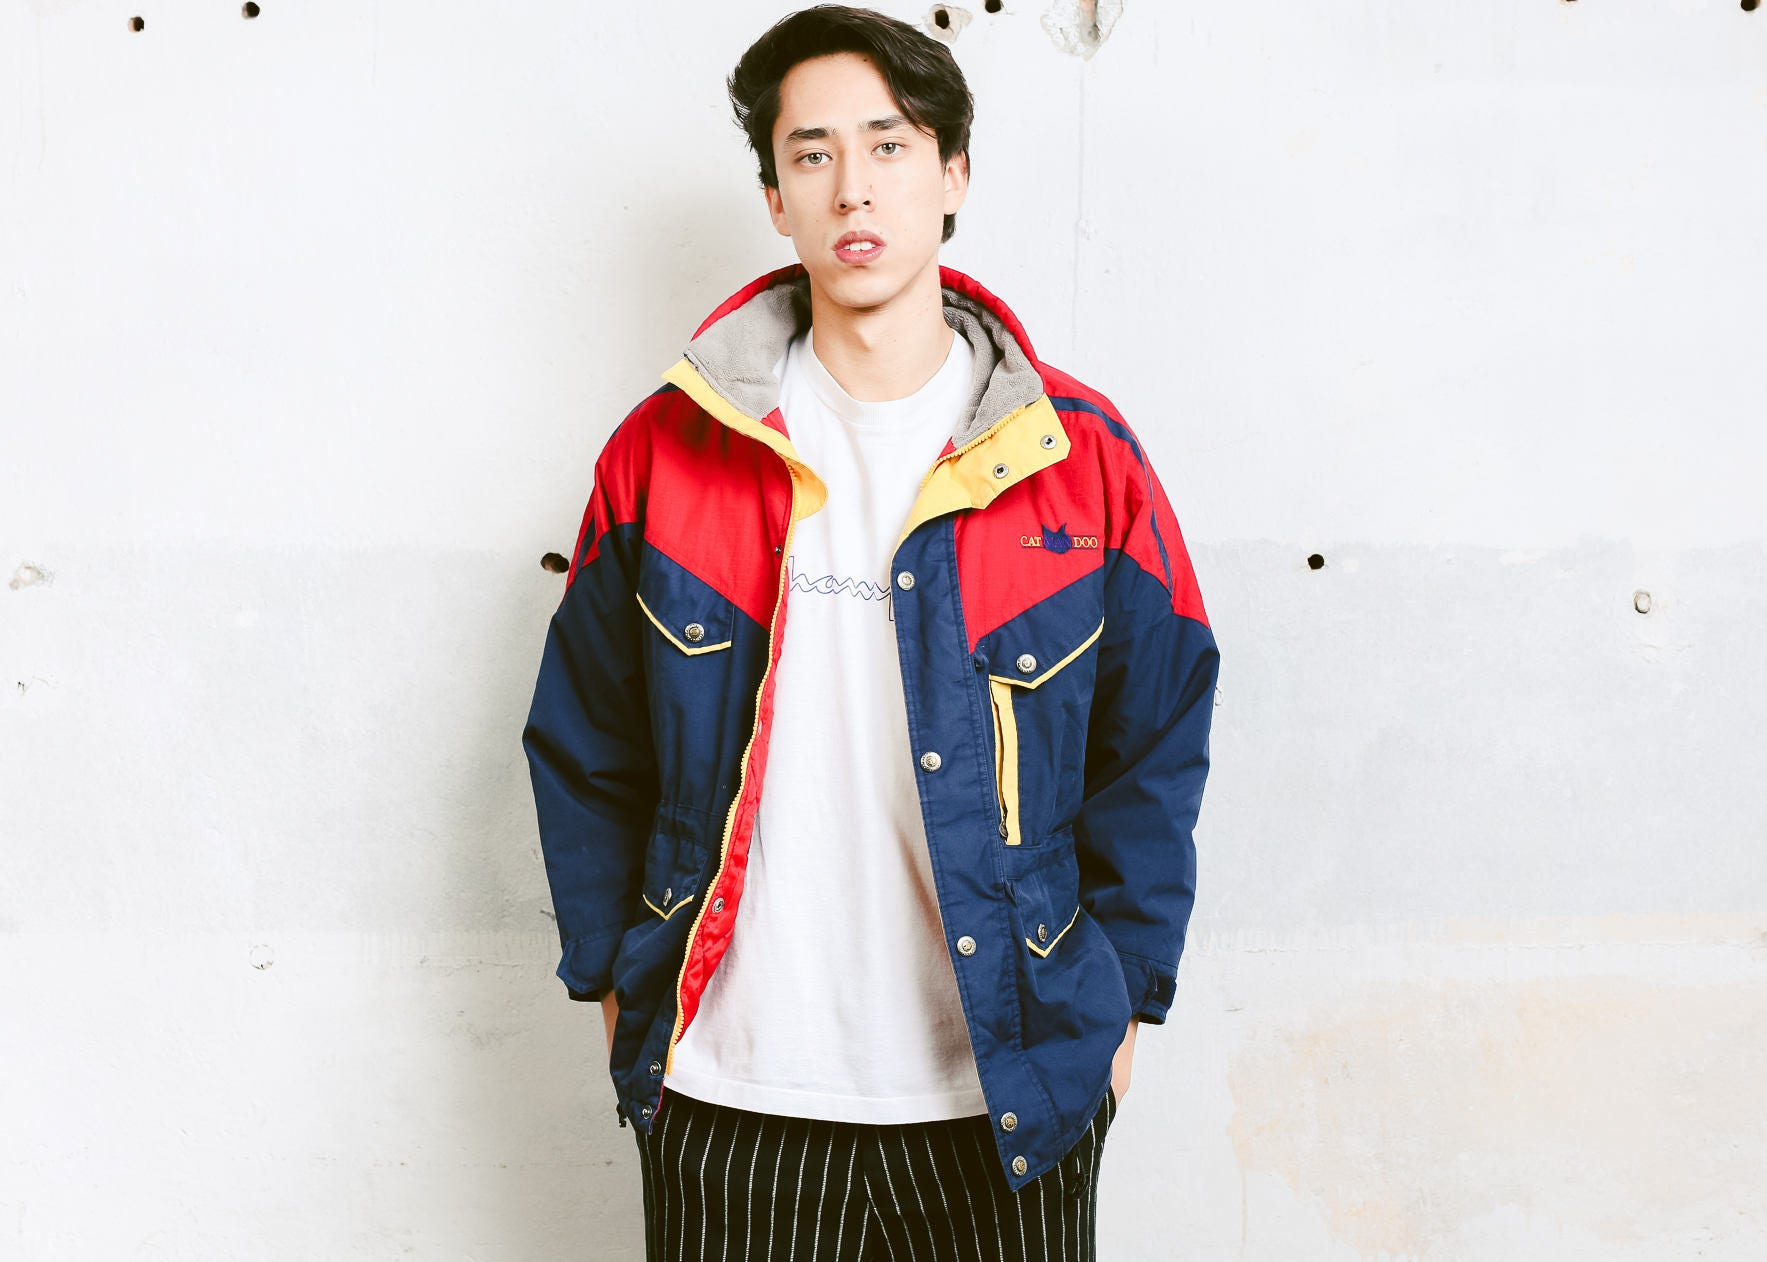 Vintage Mens Ski Jacket Men 90s Parka Winter Zip Up Colorful Coat Boyfriend Wear Clothing Size Small S